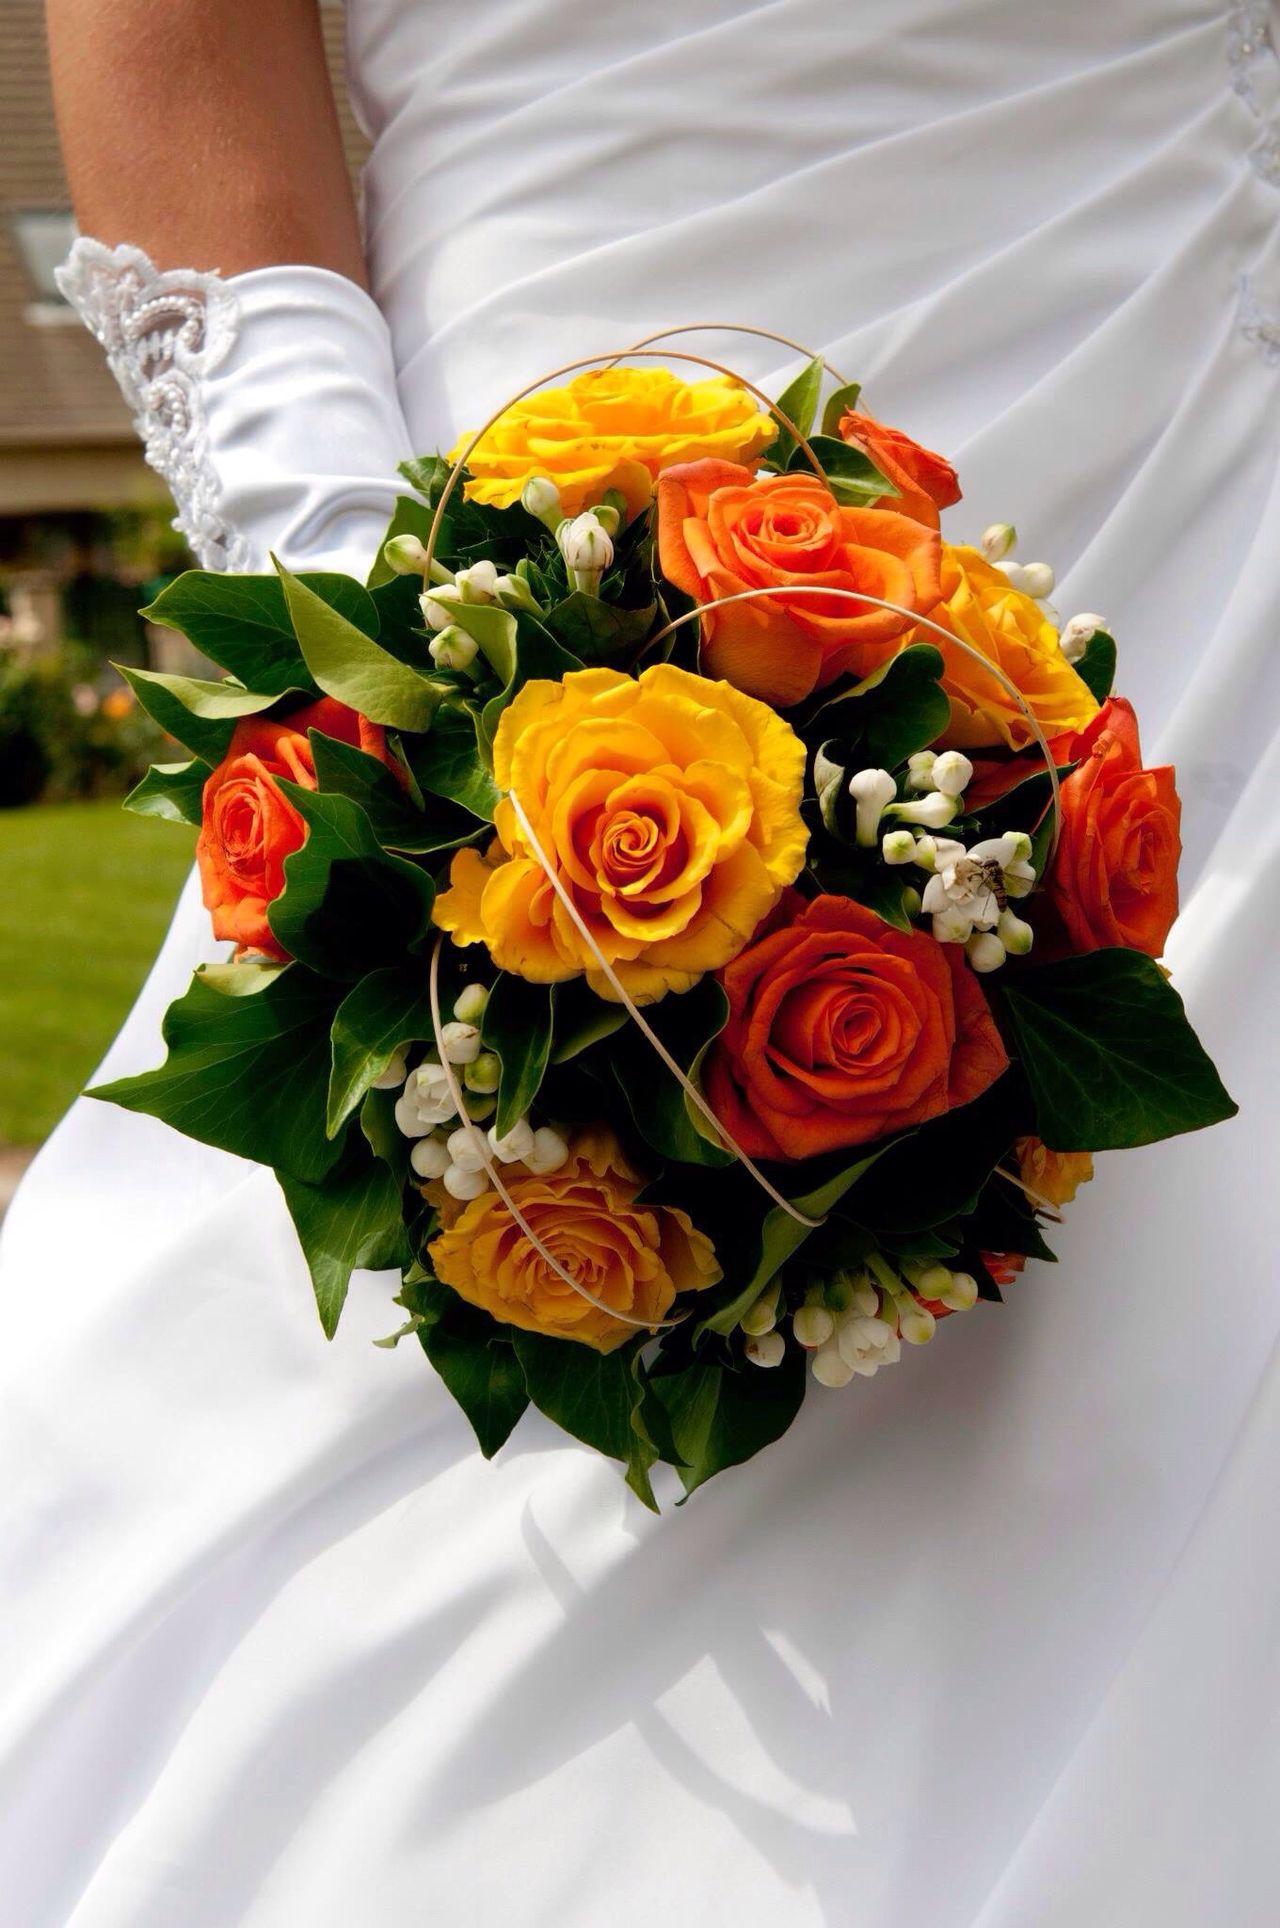 Fleur ♡ Rose - Flower Flower Head Freshness Petal Nature Bouquet Flower Beauty In Nature Marriage Ceremony Mar Maried mariées Mariee <3